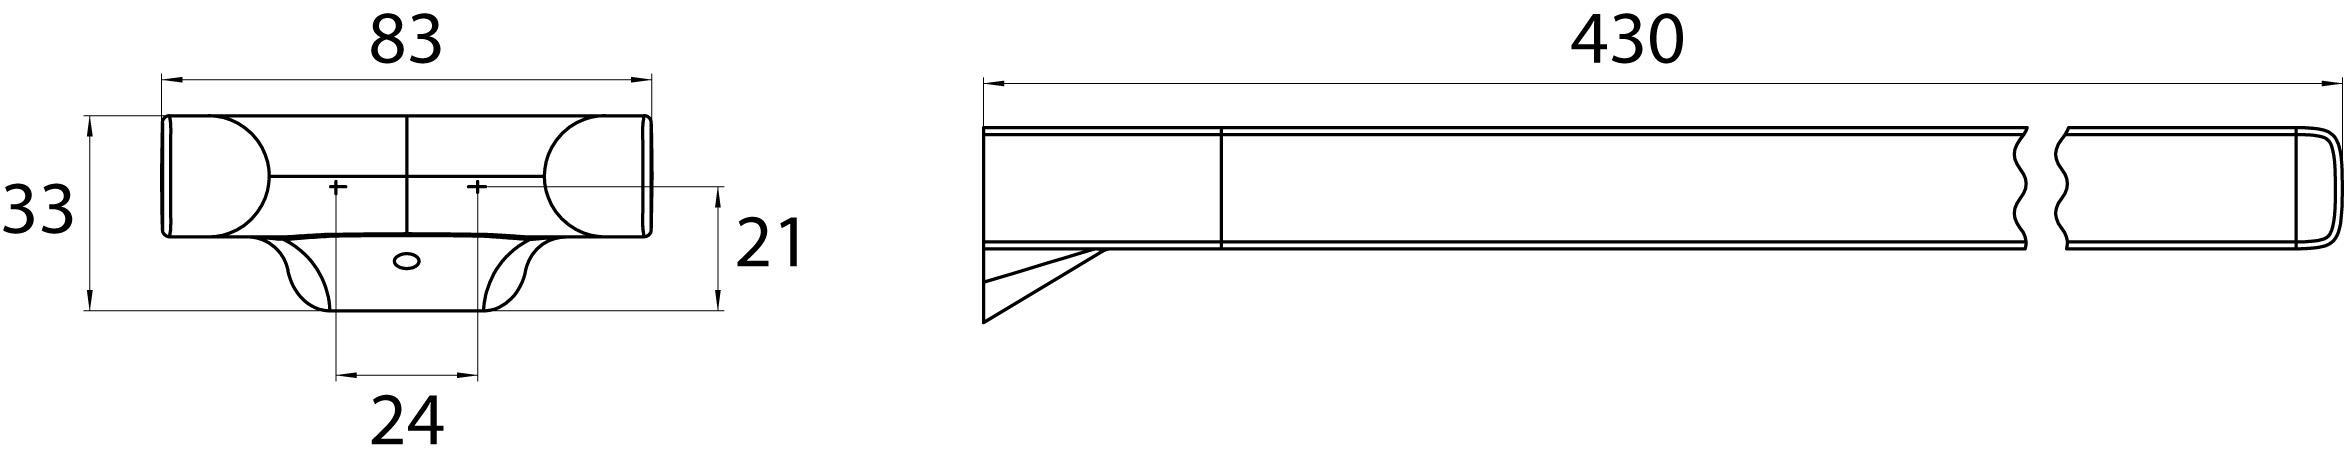 badshop veith adria handtuchhalter 2 armig 460mm vigour sanibel. Black Bedroom Furniture Sets. Home Design Ideas